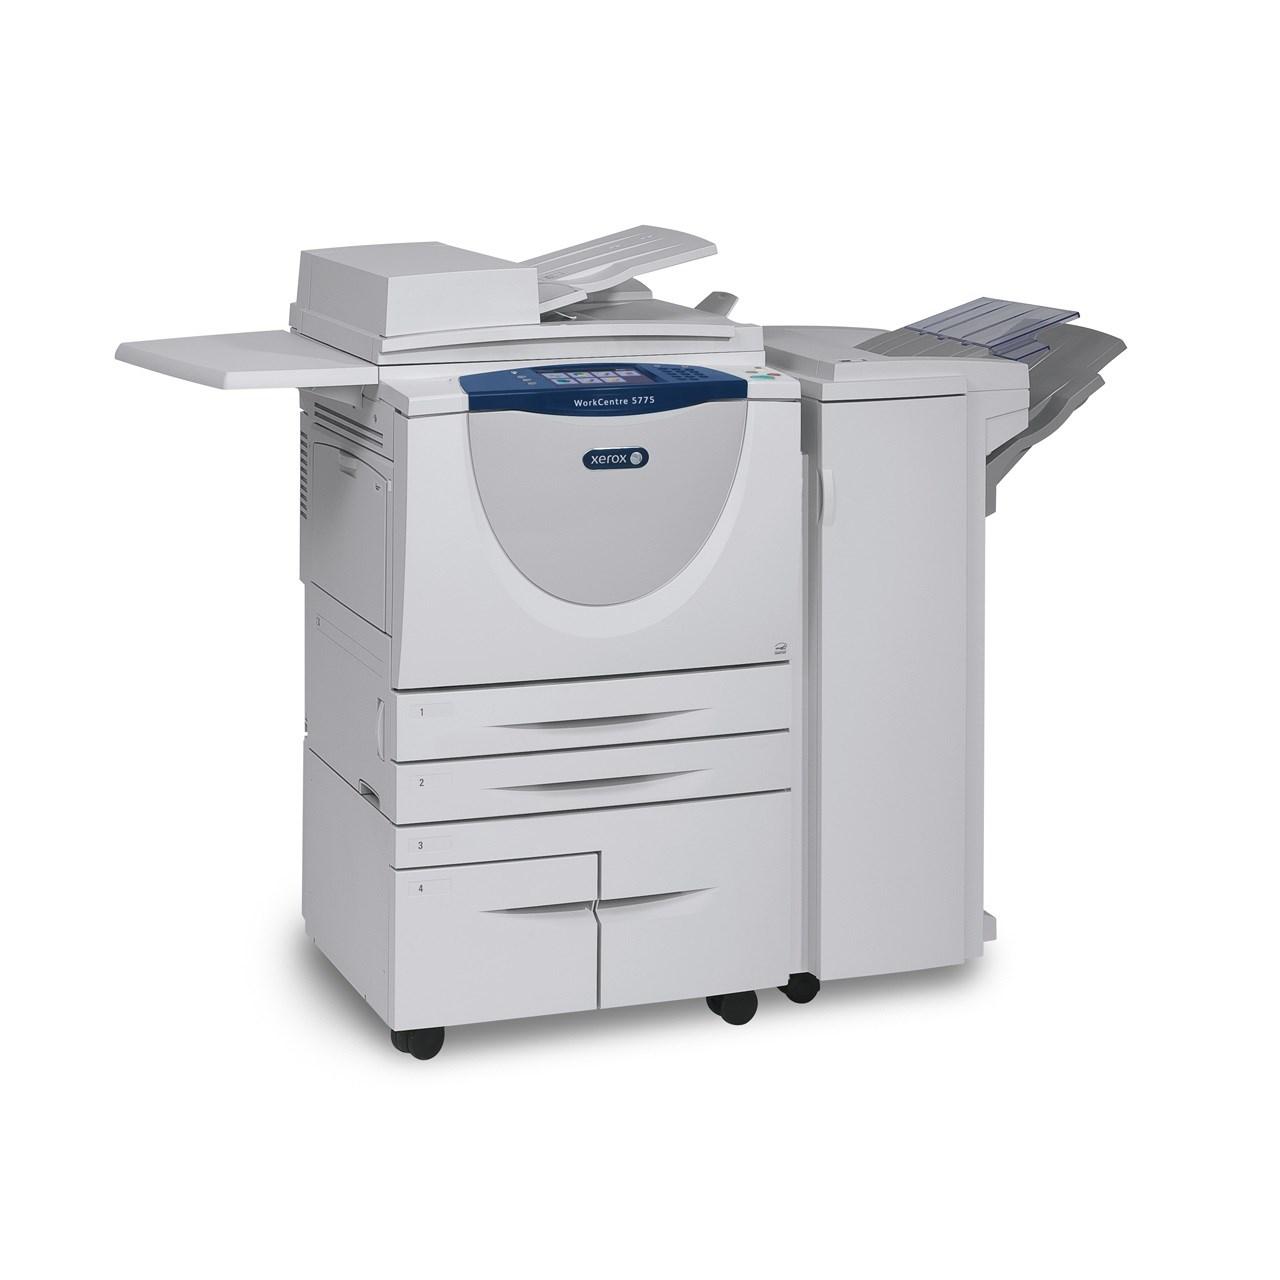 دستگاه کپی لیزری زیراکس مدل WorkCentre 5745  Multifunction Printer